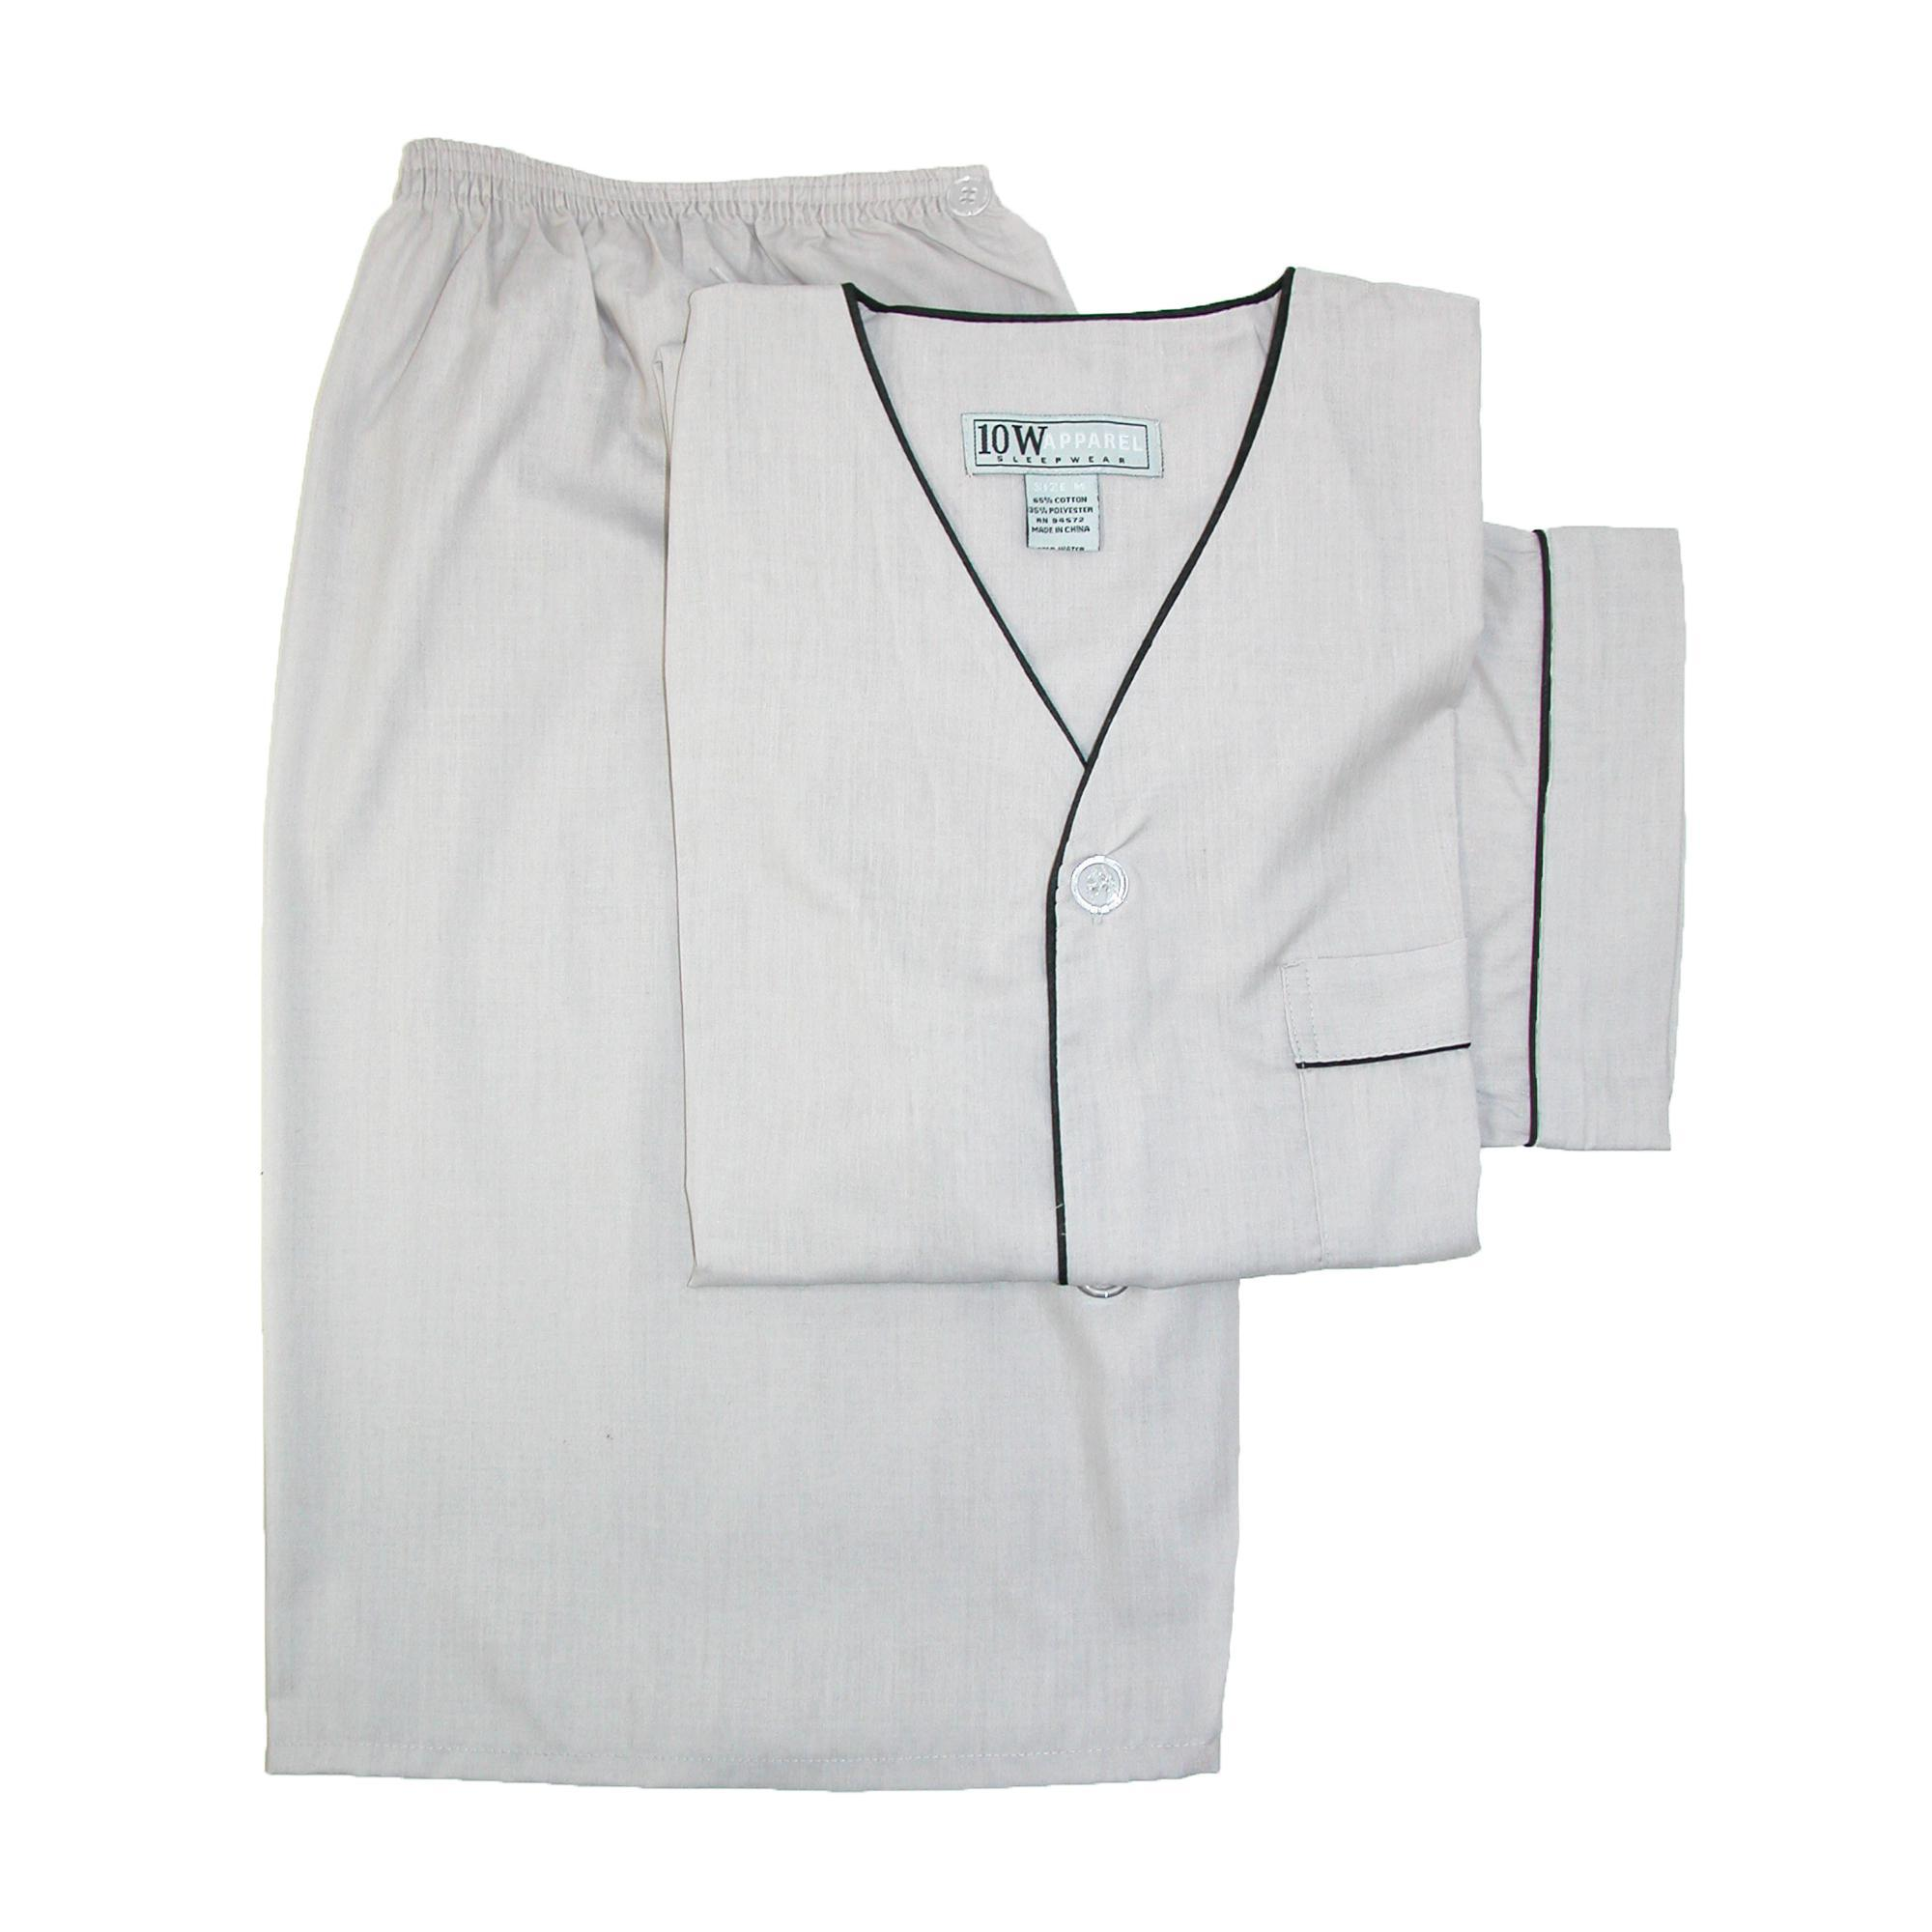 New Ten West Apparel Men's Short Sleeve Short Leg Pajama Set